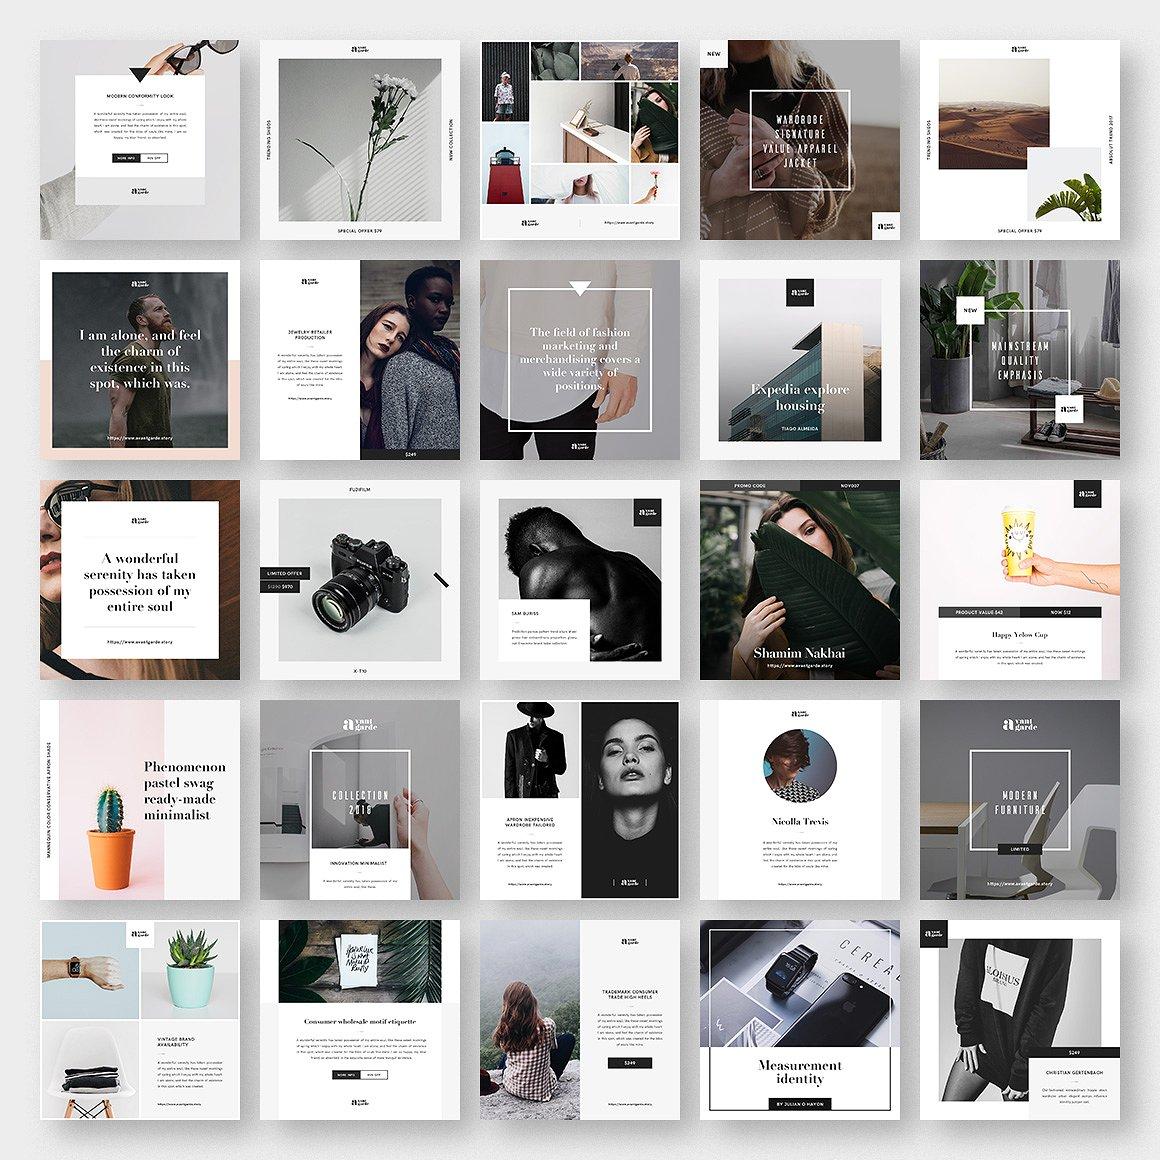 social-media-pack-by-goashape-showcase-all-squares-.jpg